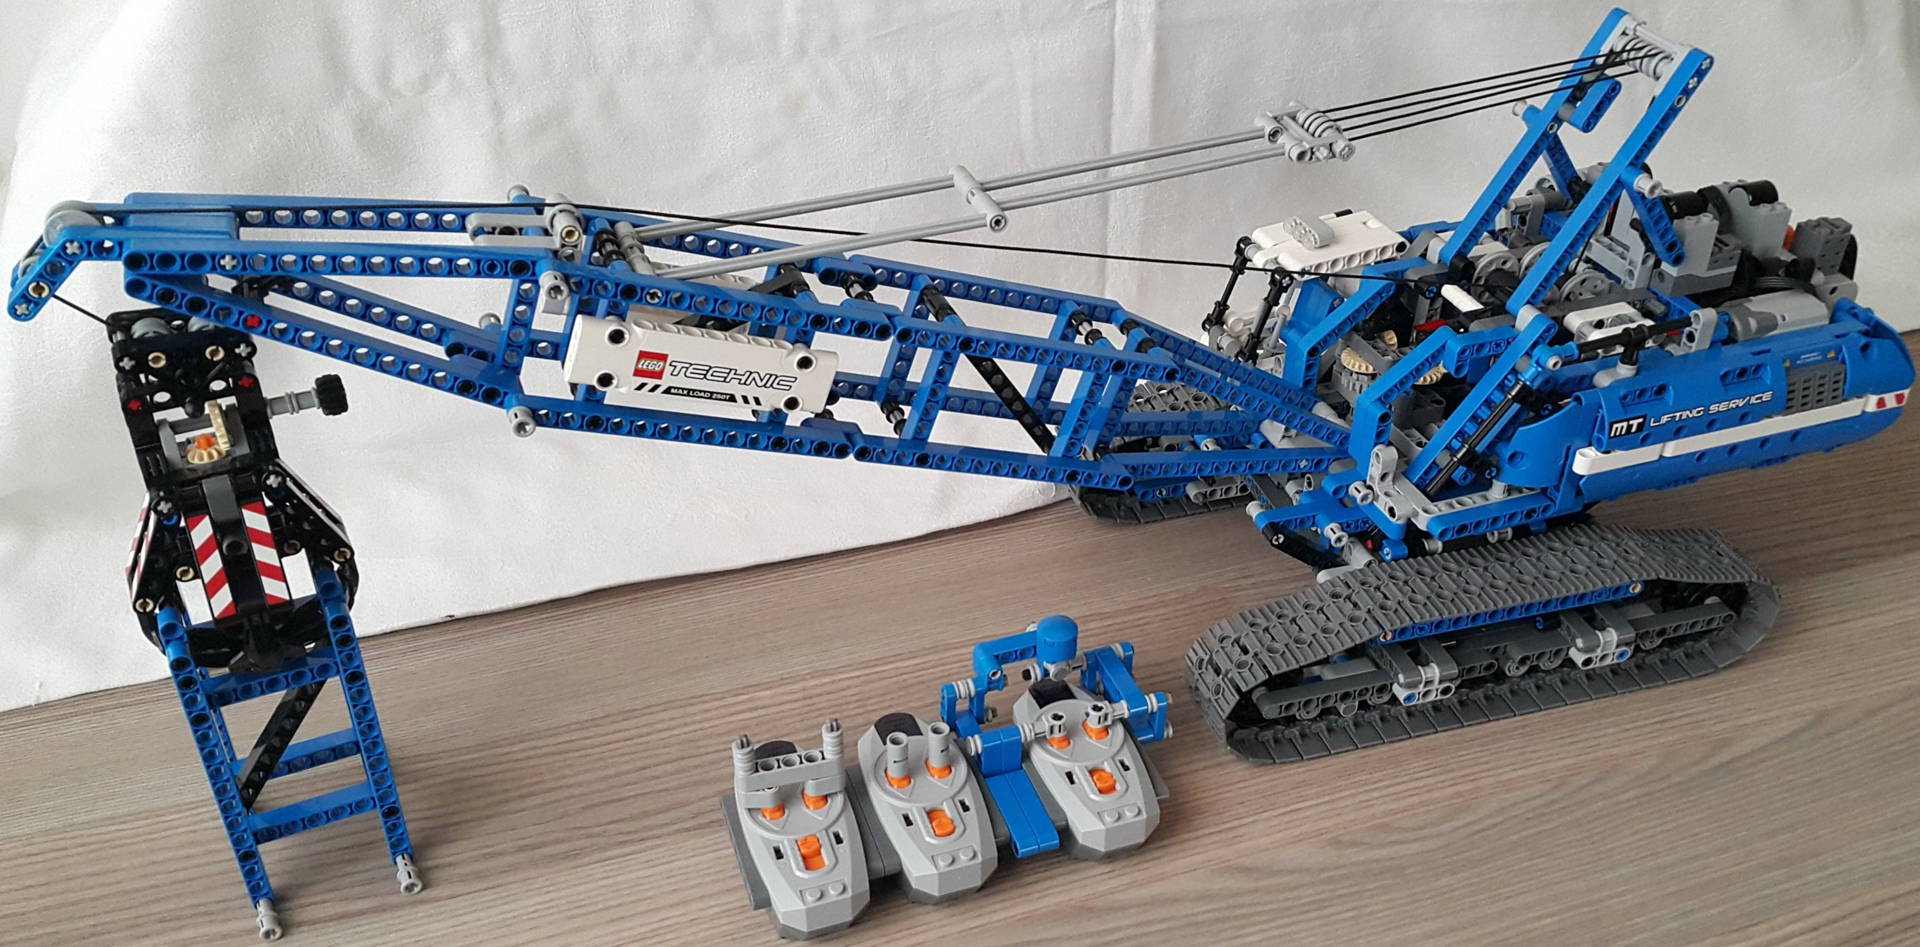 Lego Moc 4078 42042 Rc Technic 2015 Rebrickable Build With Lego